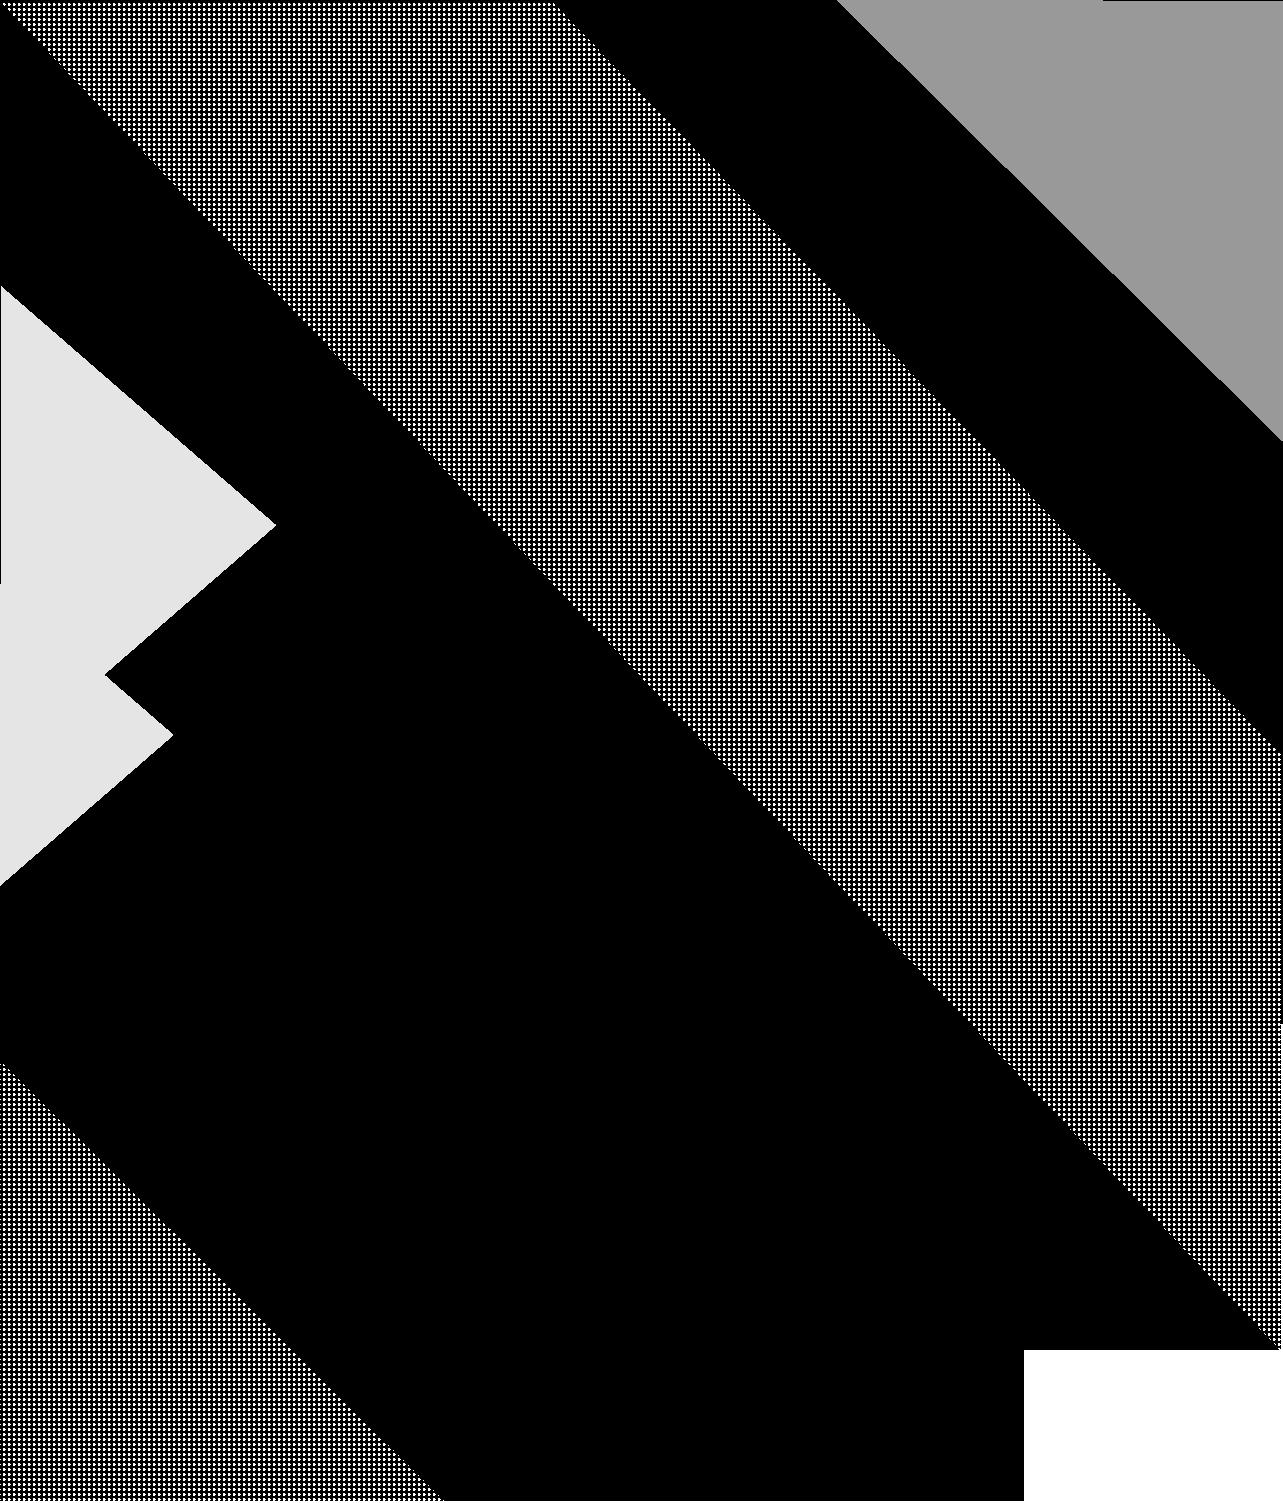 LineShapeDots_Wht__Trans_20__1283x1503__.png